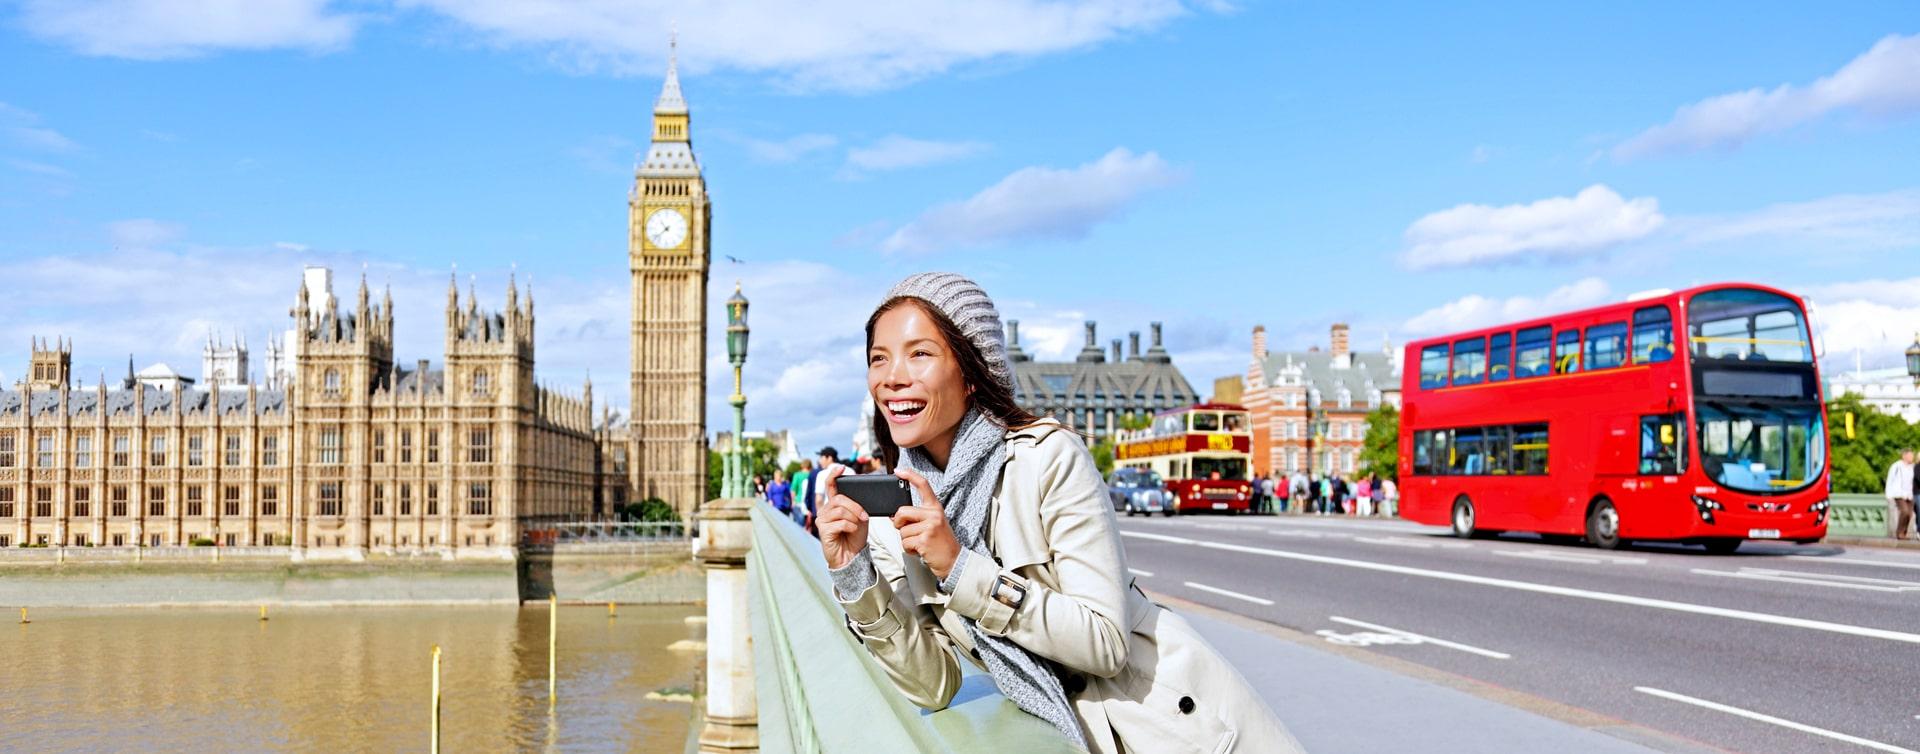 inglés en el extranjero